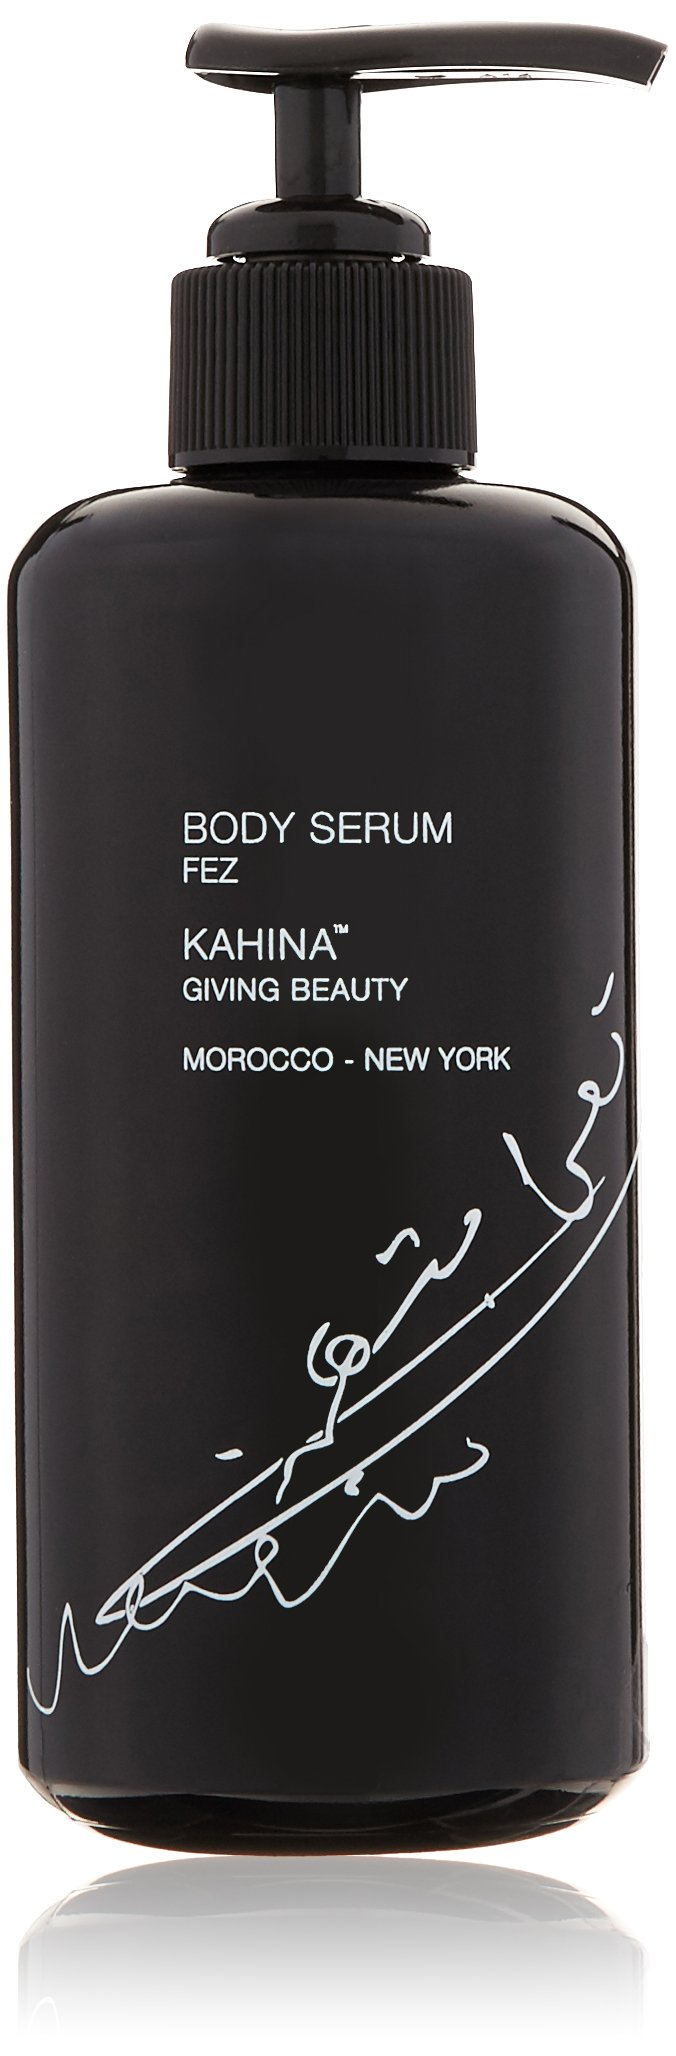 Kahina Giving Beauty Fez Body Serum, 6.7 fl. oz.